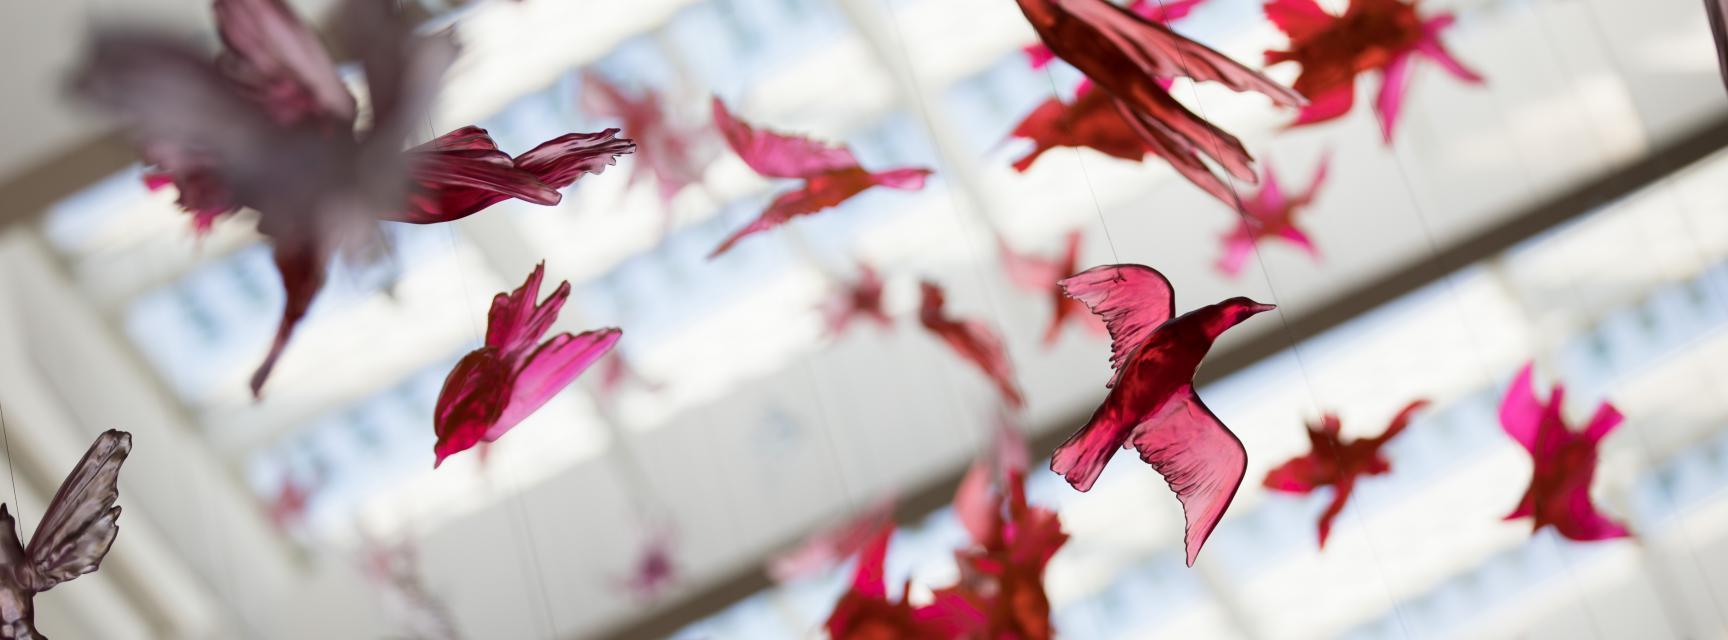 Department of Biochemistry Image Taken by Fisher Studios